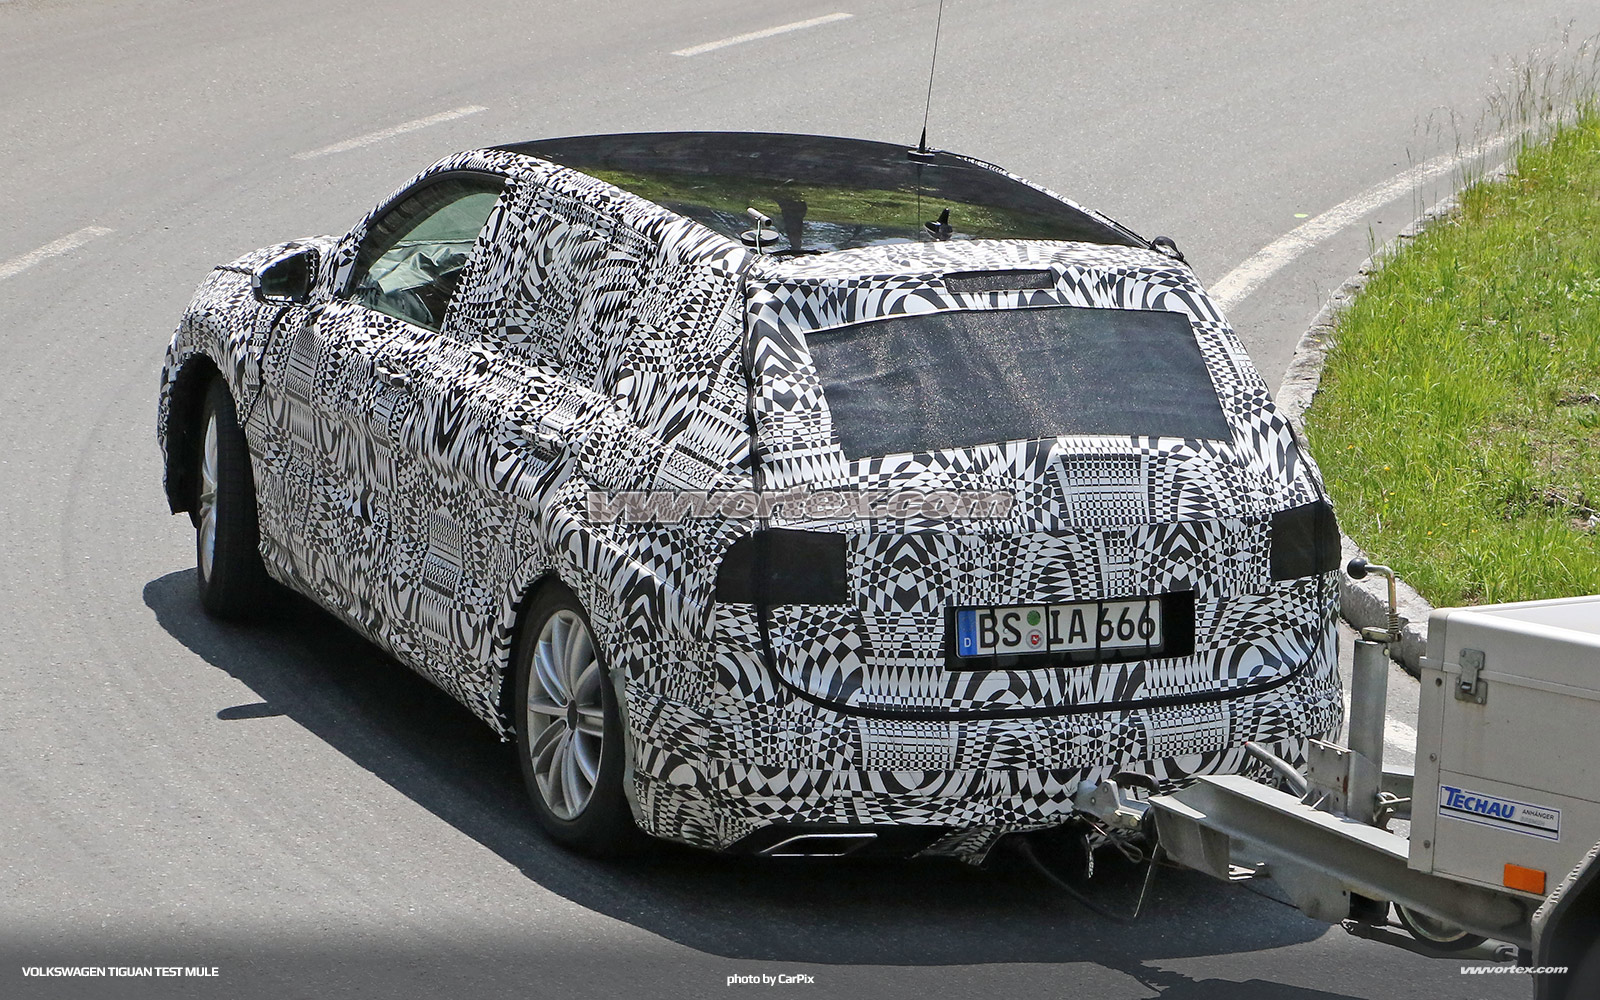 Audi-Q2-test-mule-4927